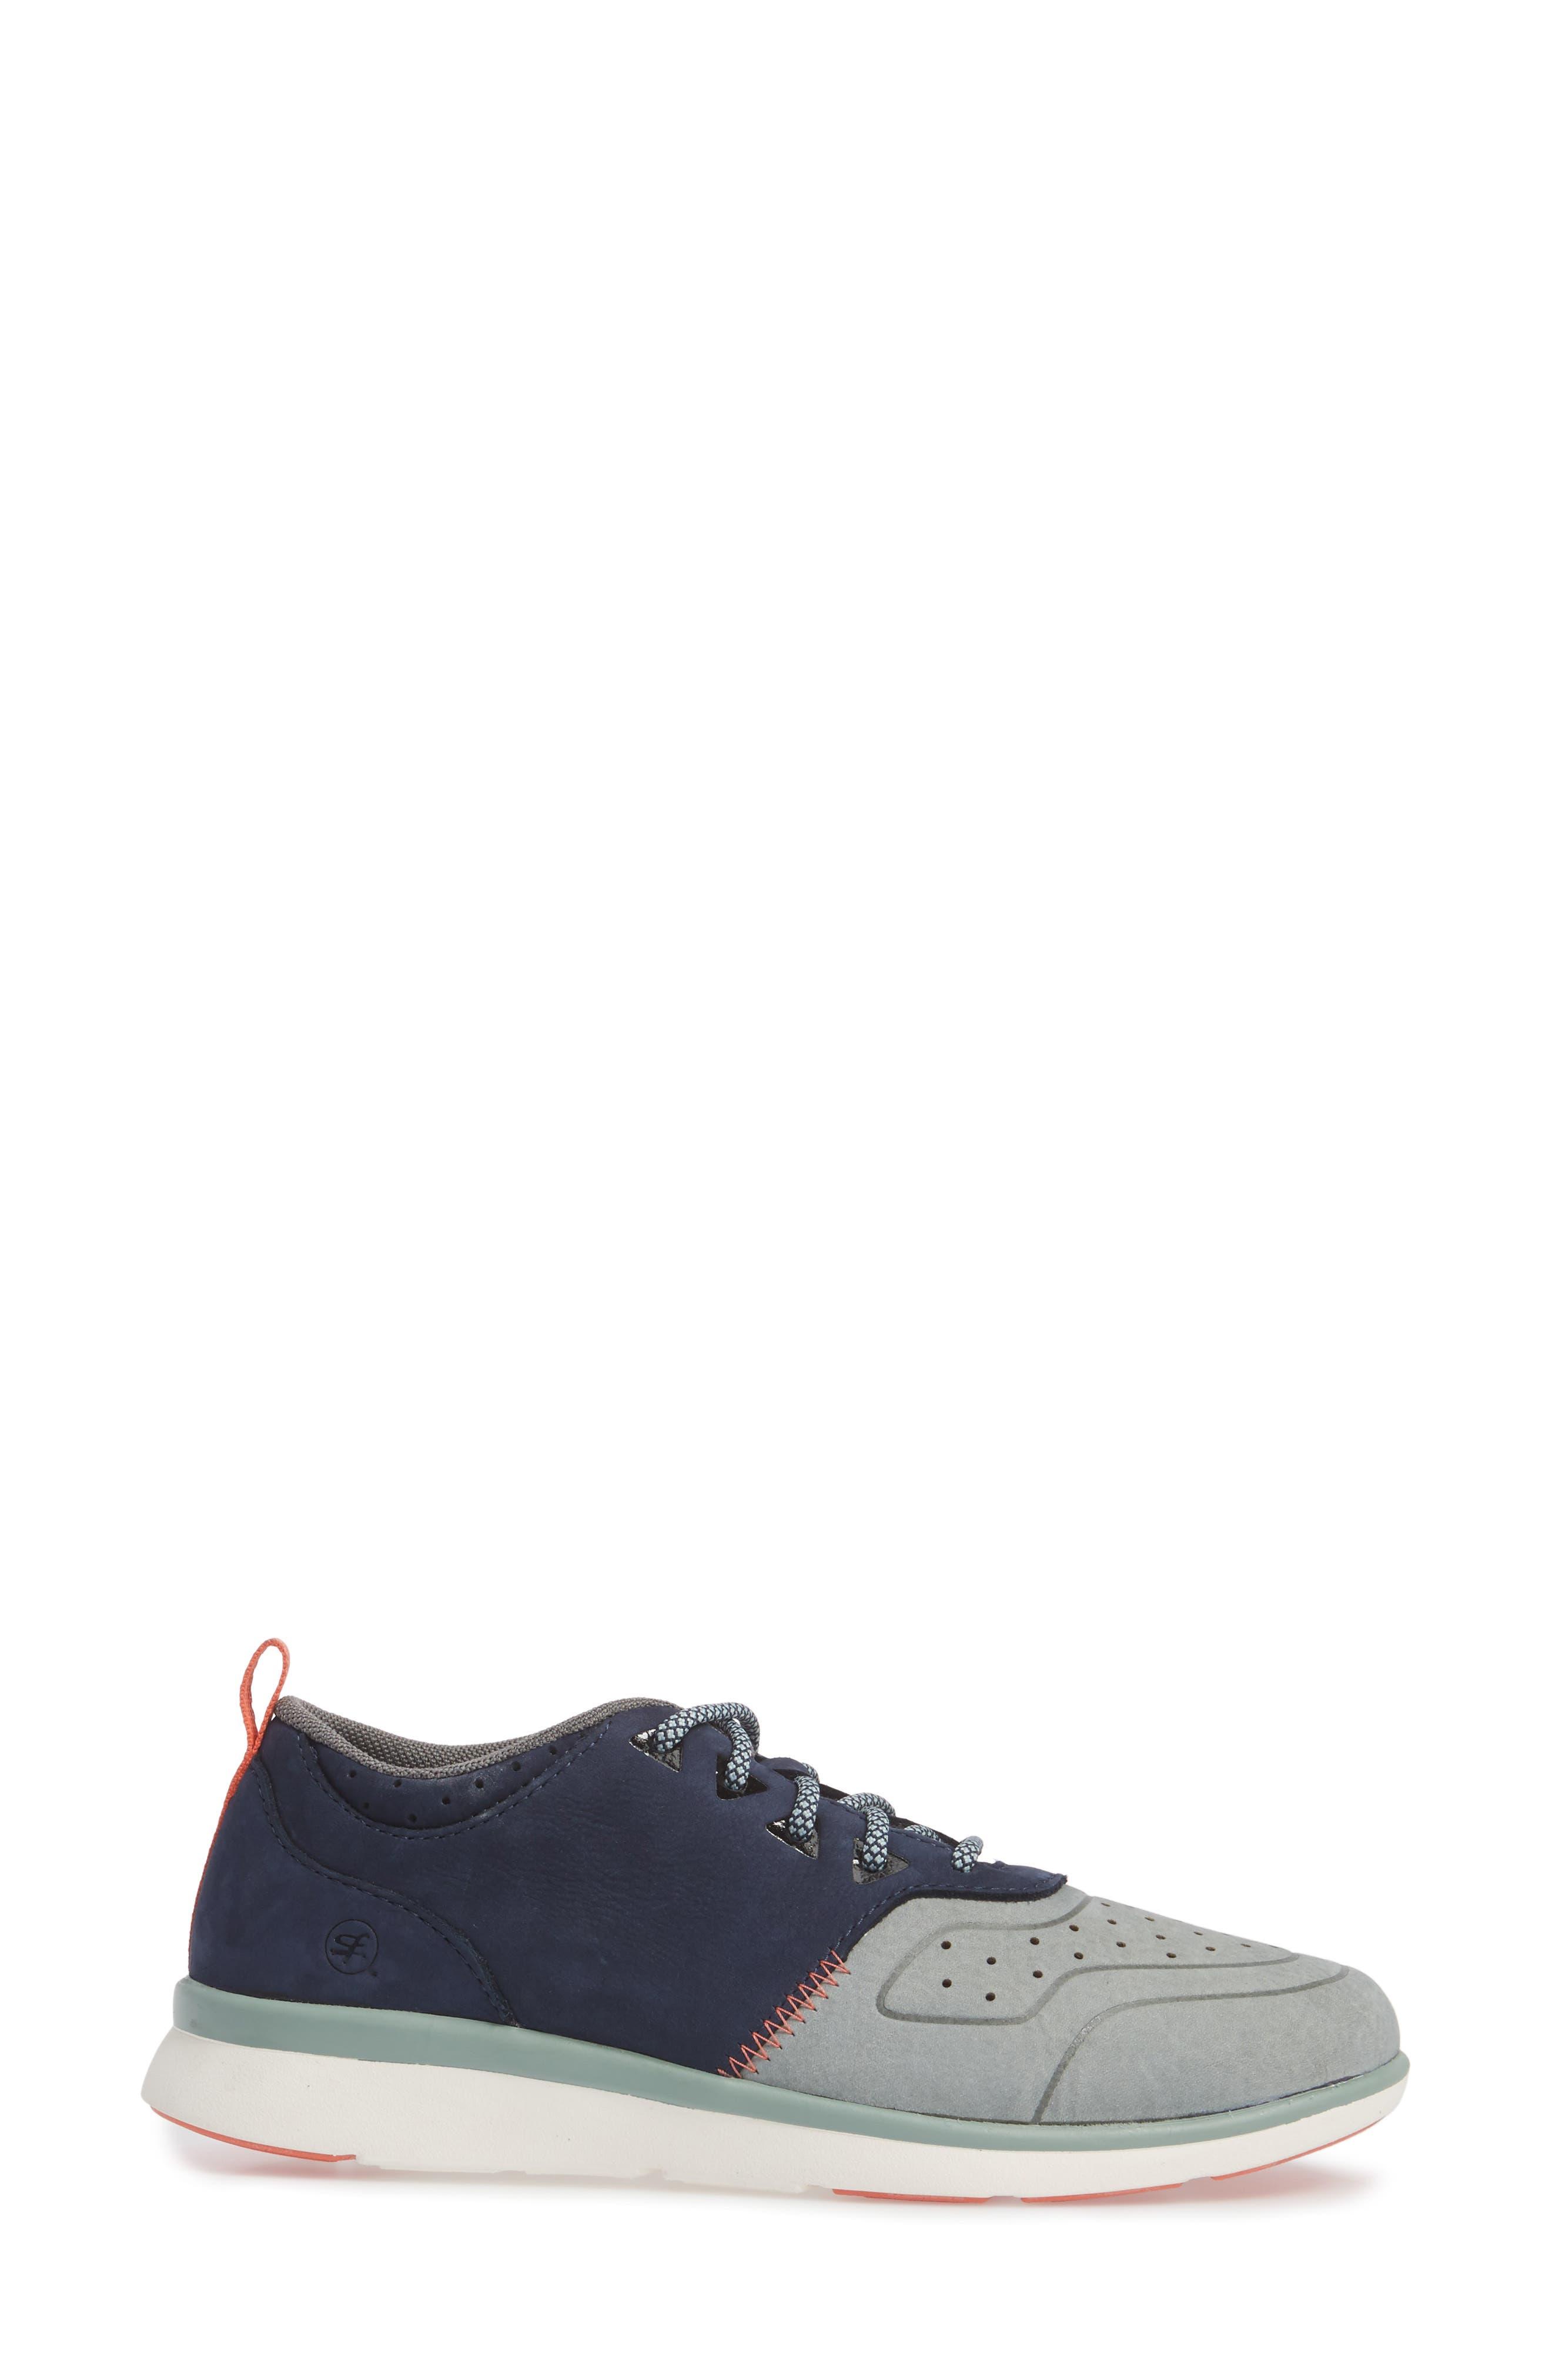 Beech Sneaker,                             Alternate thumbnail 3, color,                             Blue Leather